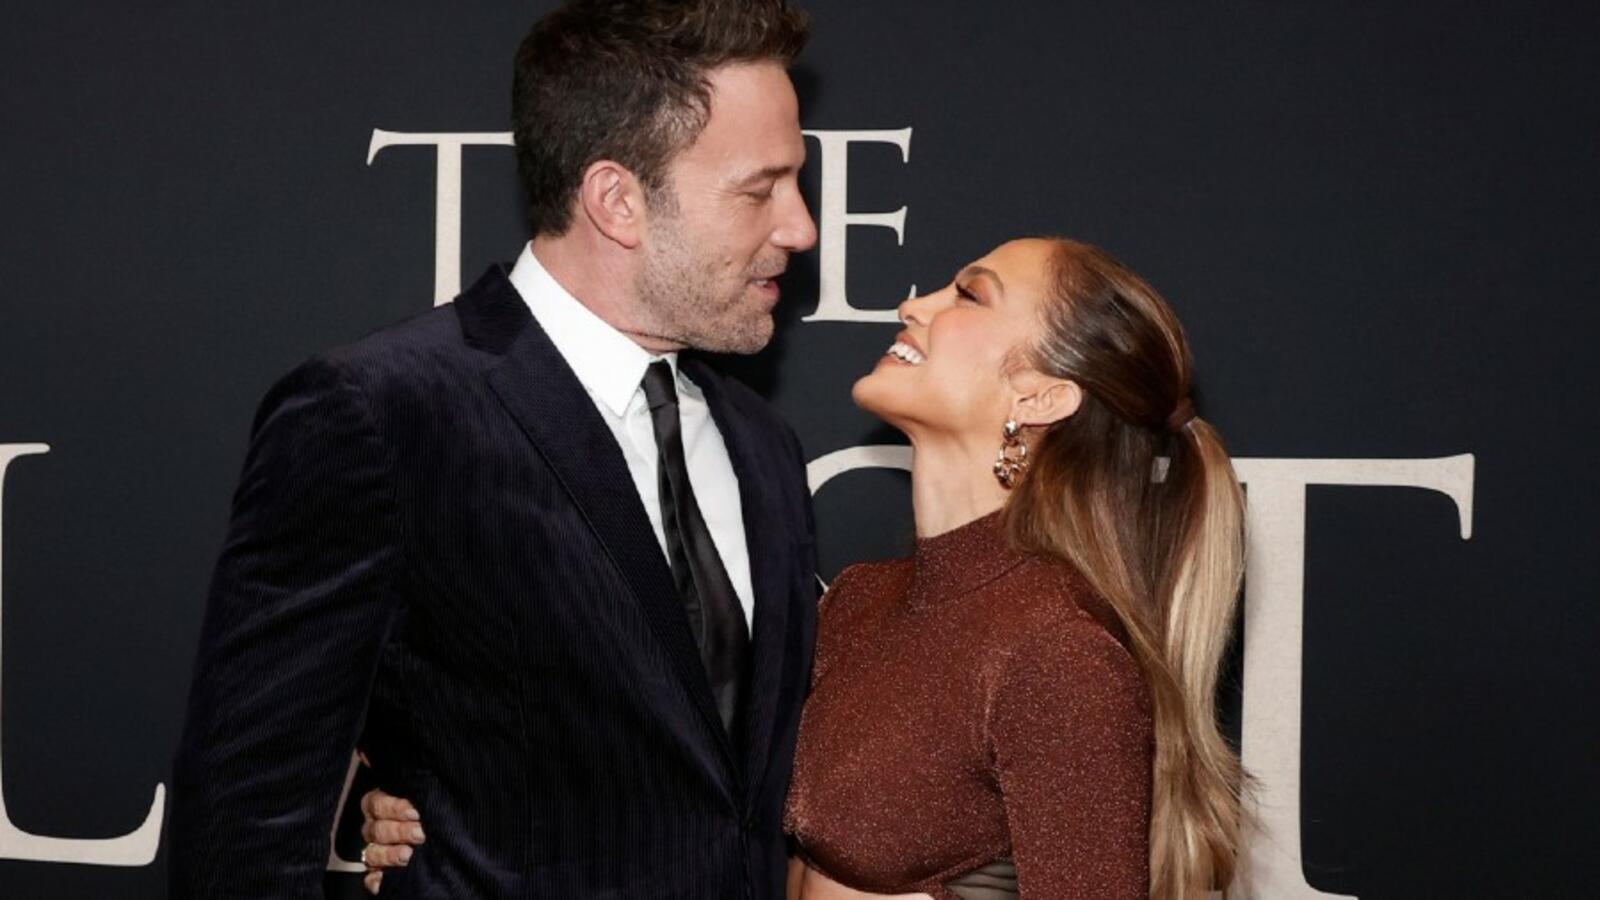 Jennifer Lopez & Ben Affleck Have To Strategically Plan Their Time Together